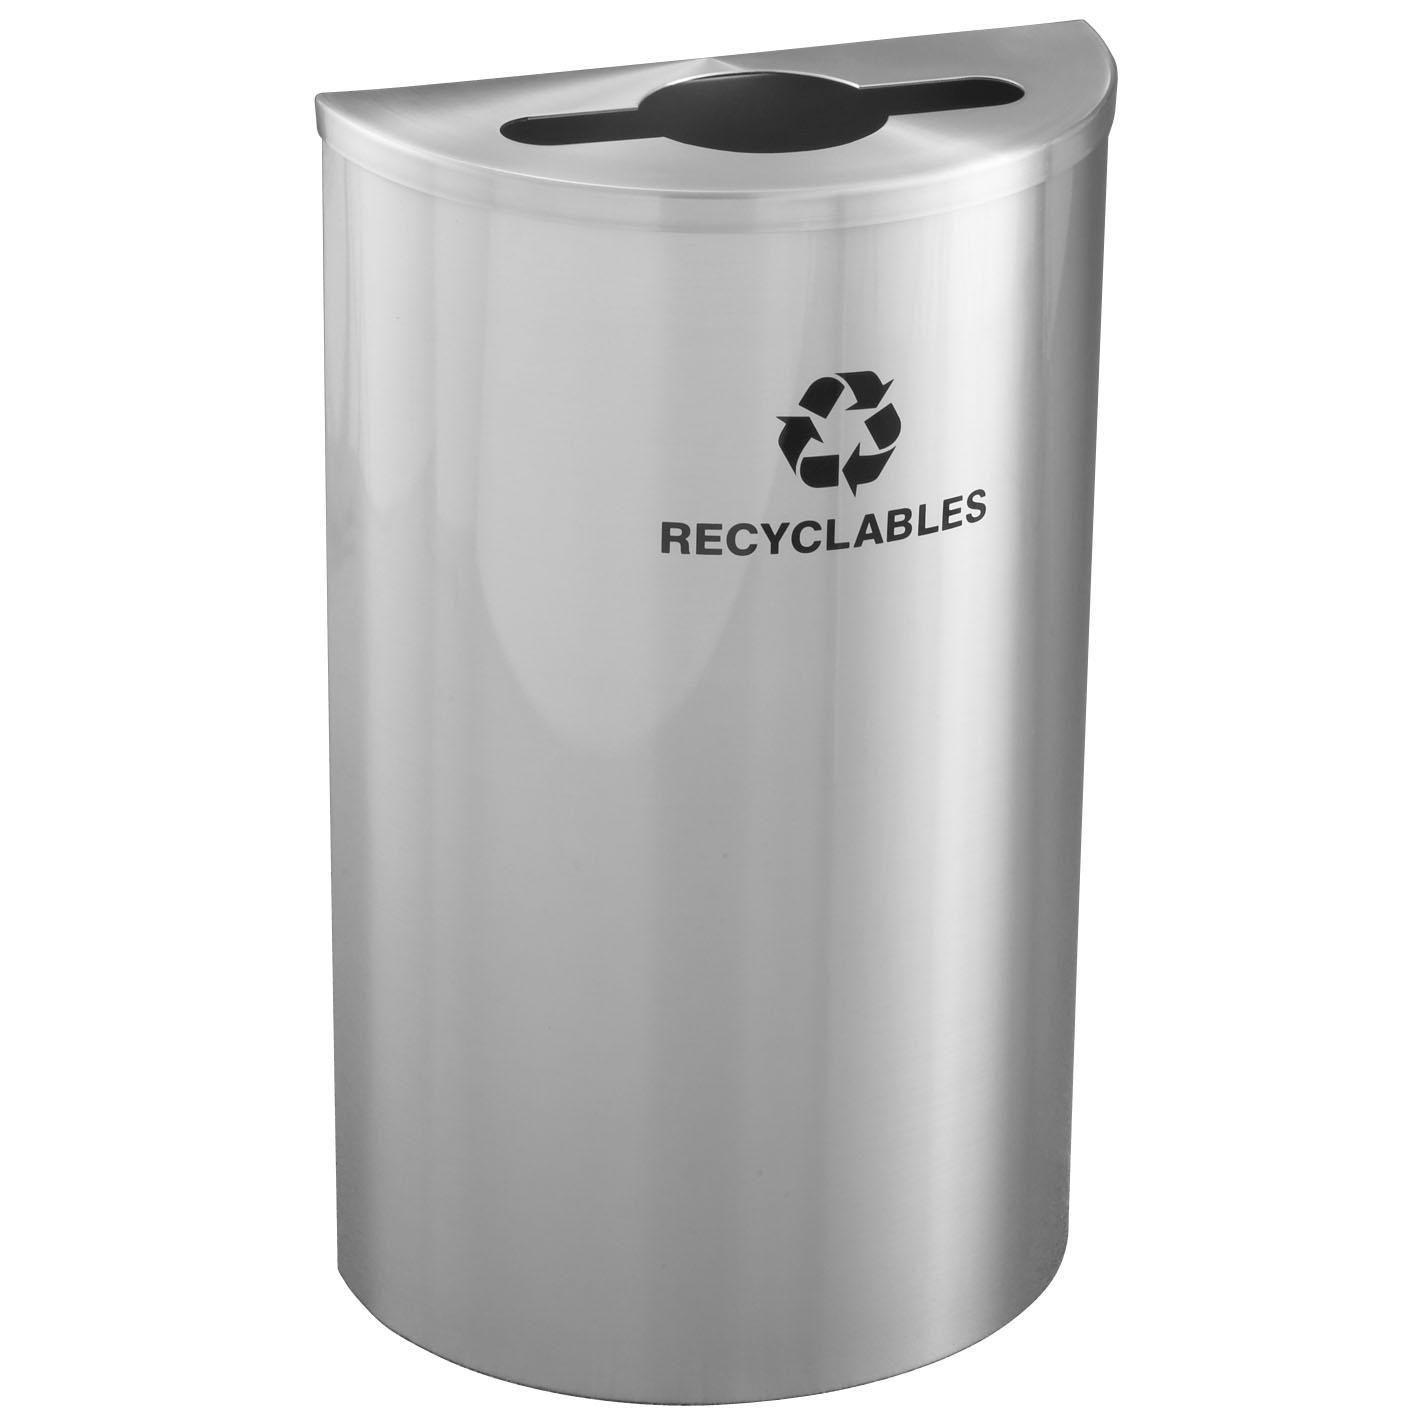 Aluminium Trash Cans : Glaro half round gallon steel recycling bin recycle away